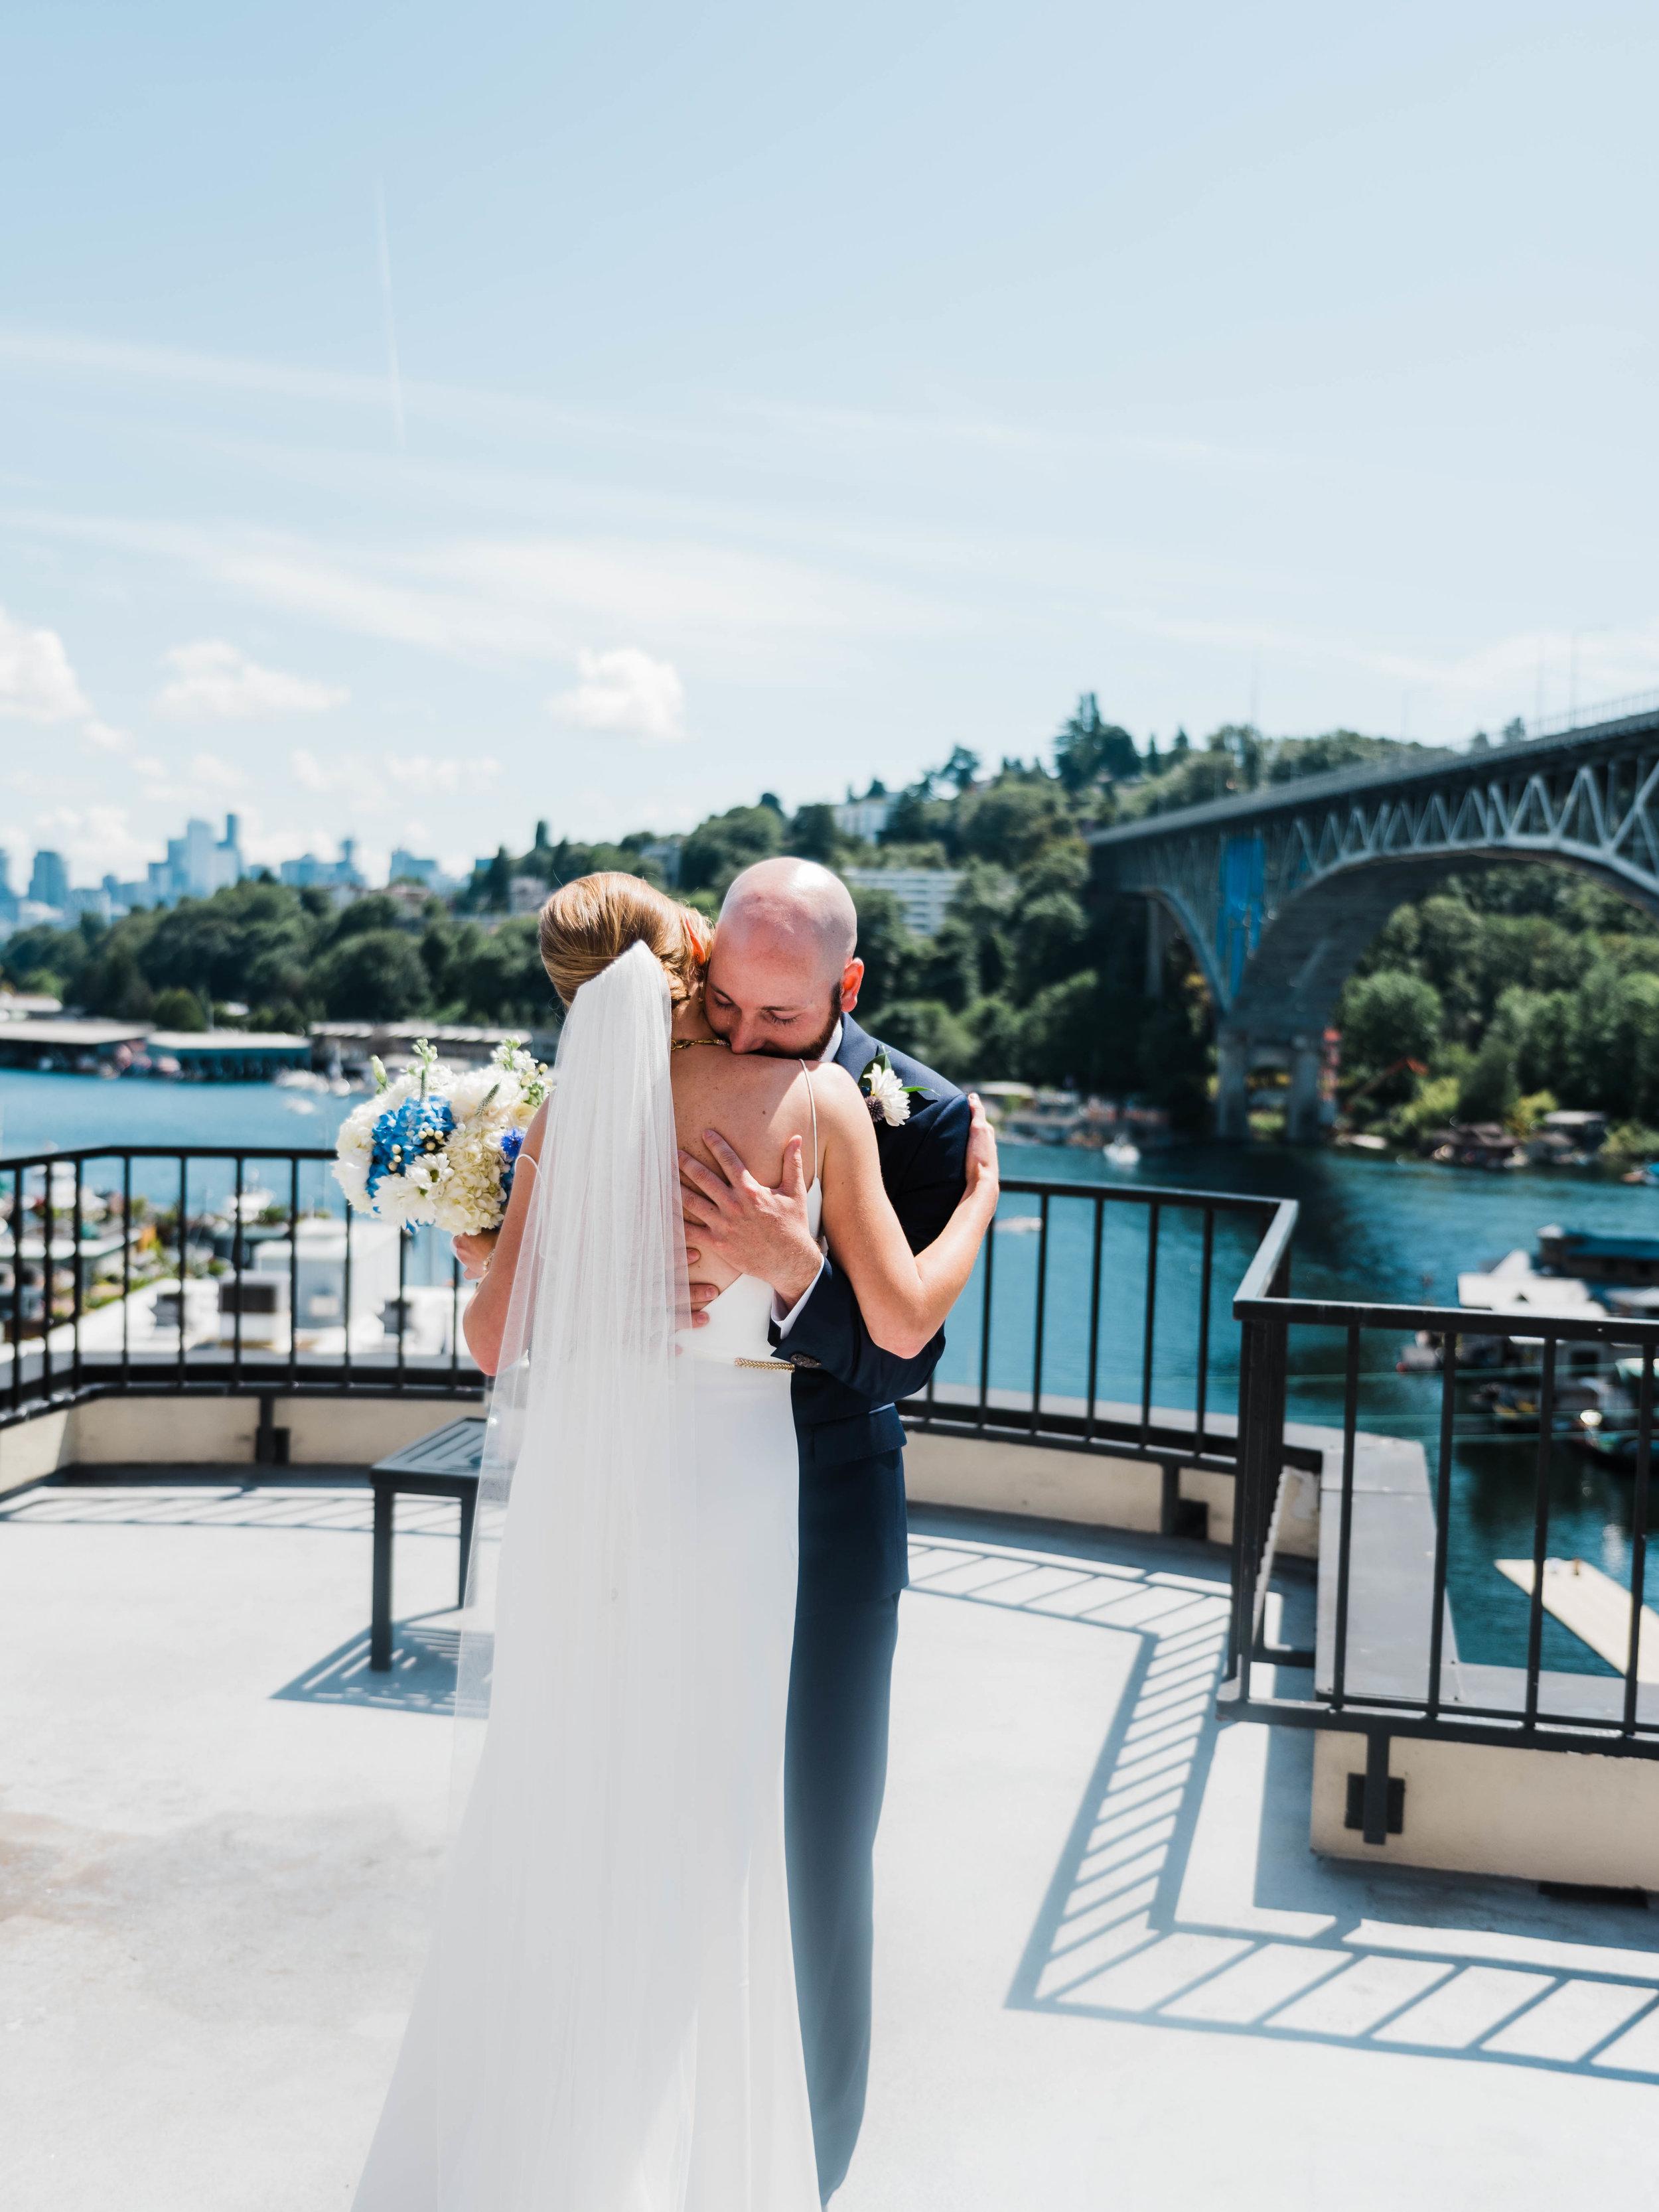 Seattle Wedding- MV Skansonia - Anna + Josh -  (346) - Copy.jpg